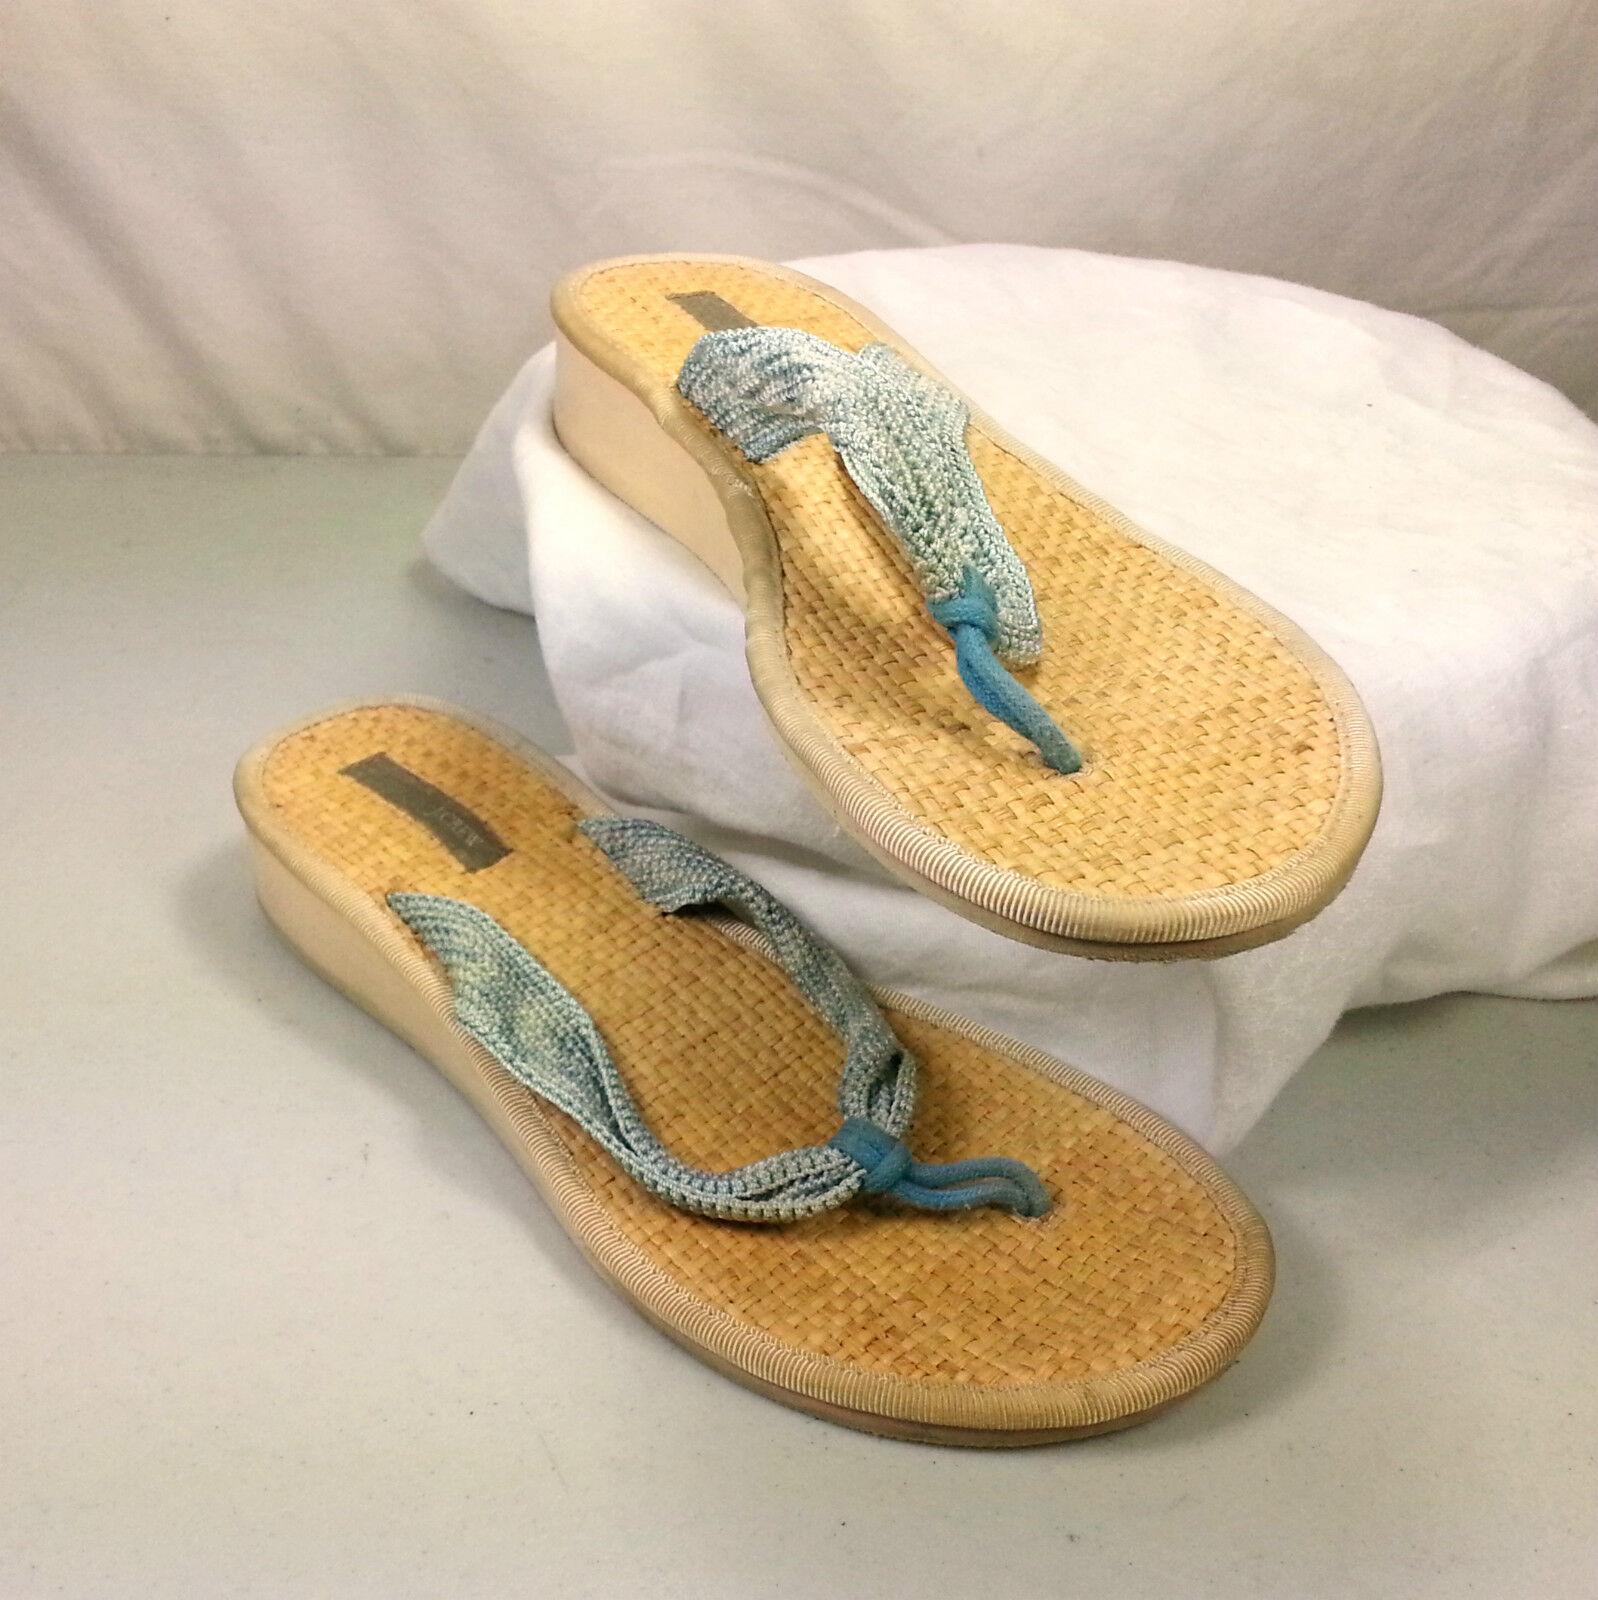 J. Crew Womens Flip Flops Sandals Blue Bed Strap Basket Weave Foot Bed Blue Size 6 b6780e